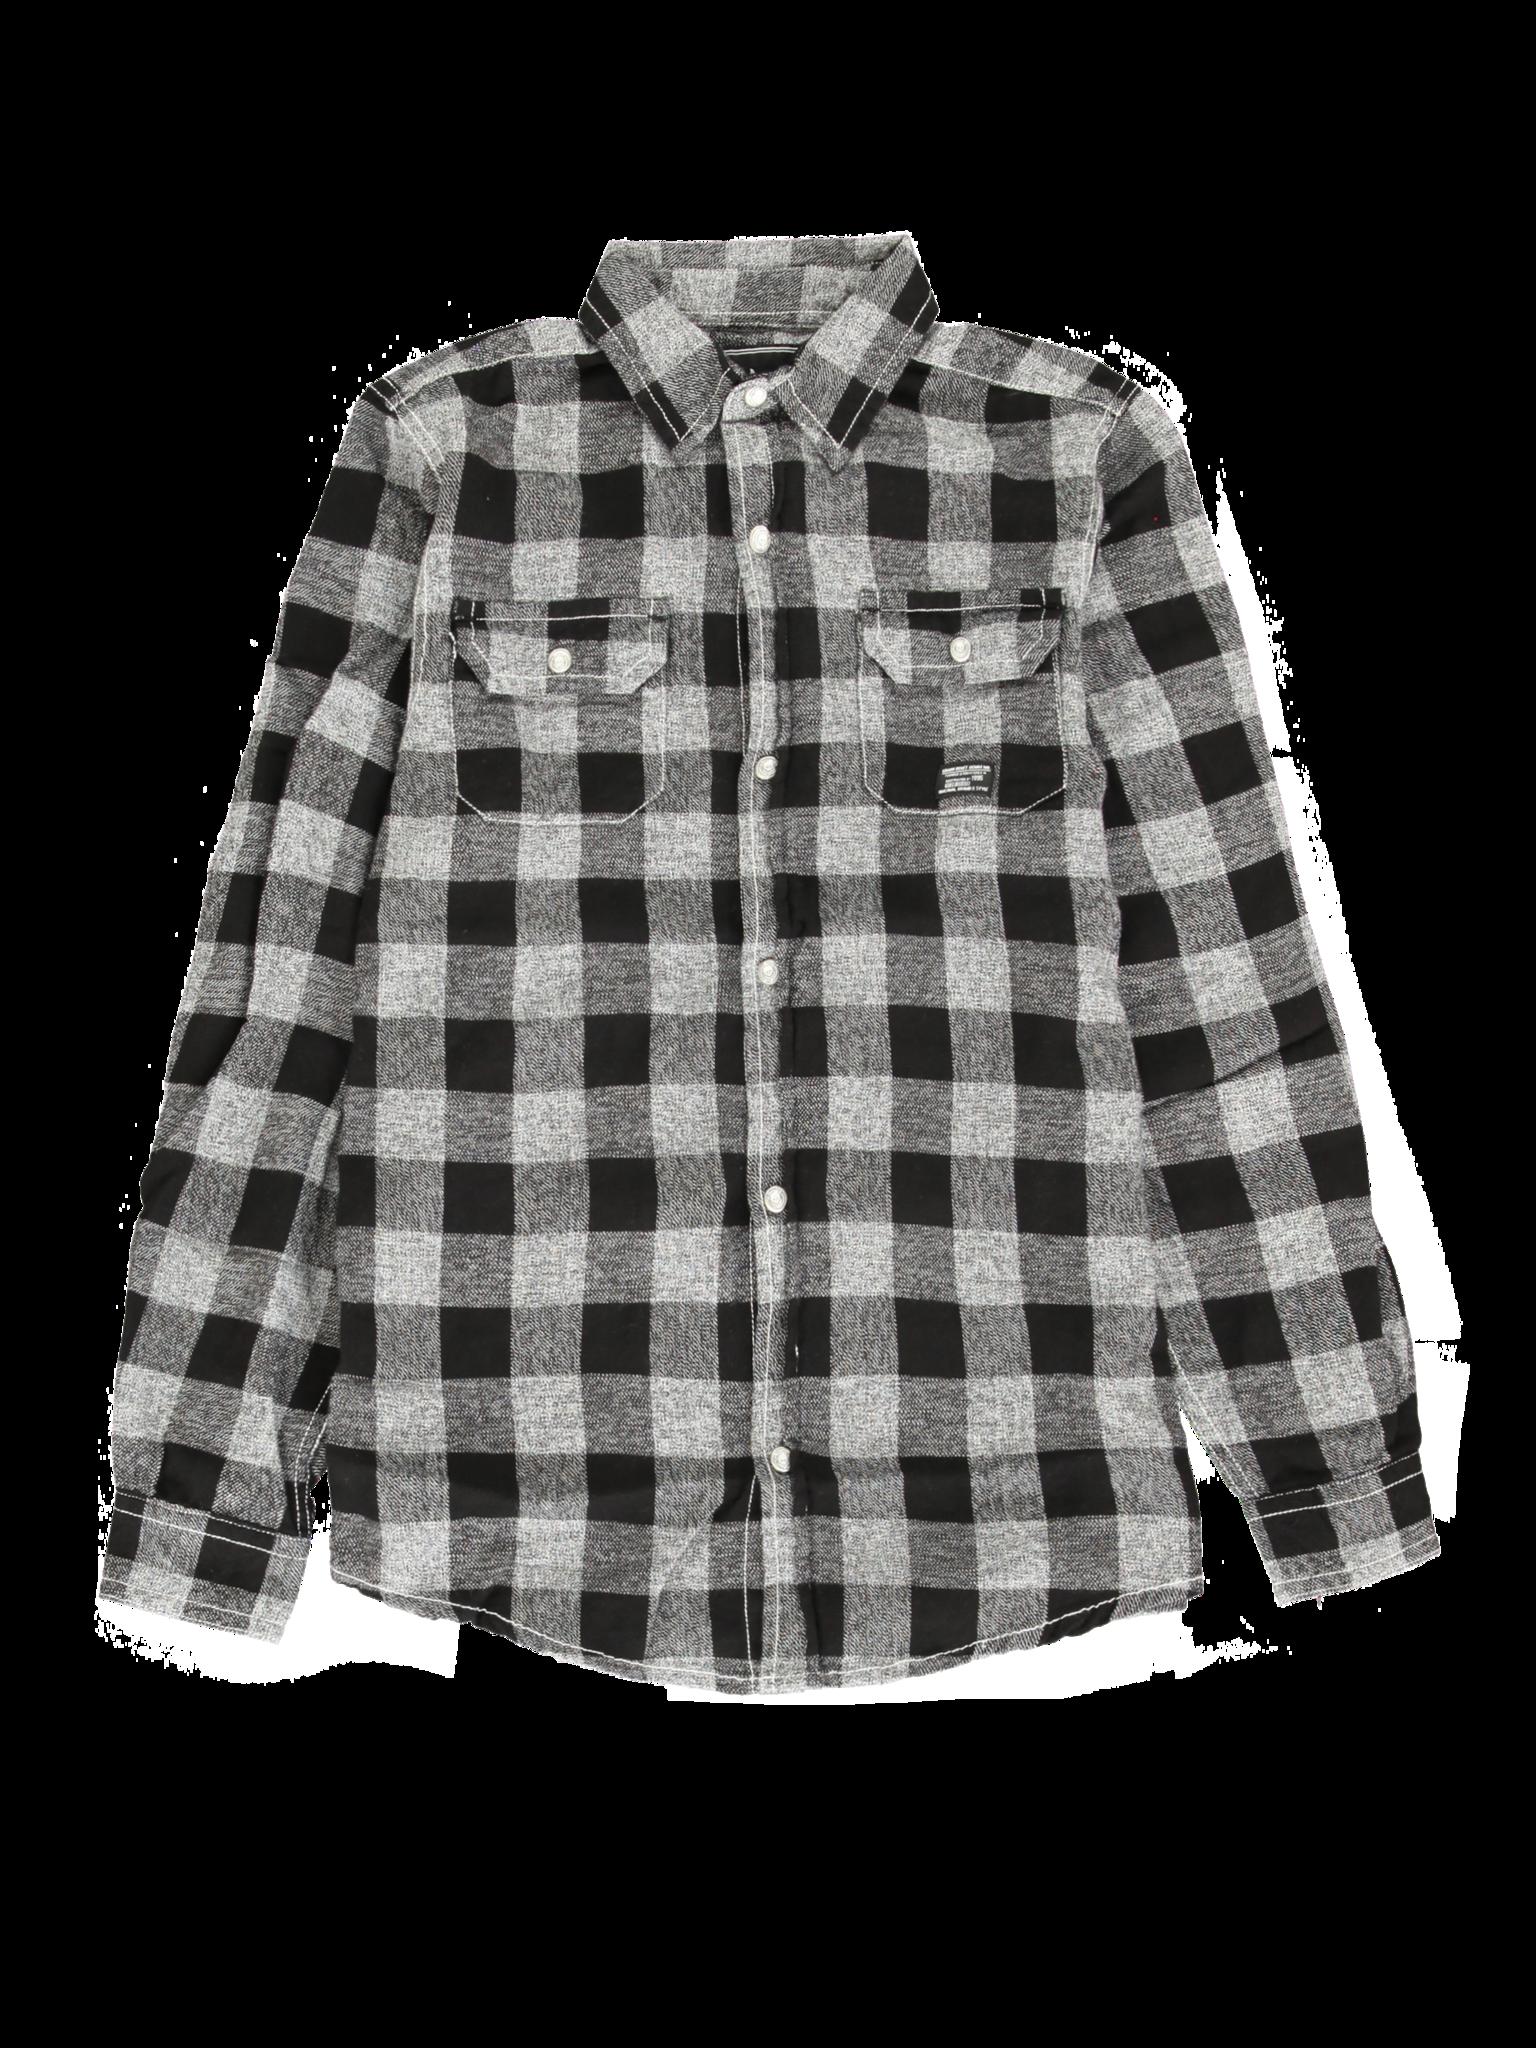 All Brands | Winterproducts Teen Boys | Shirt | 12 pcs/box